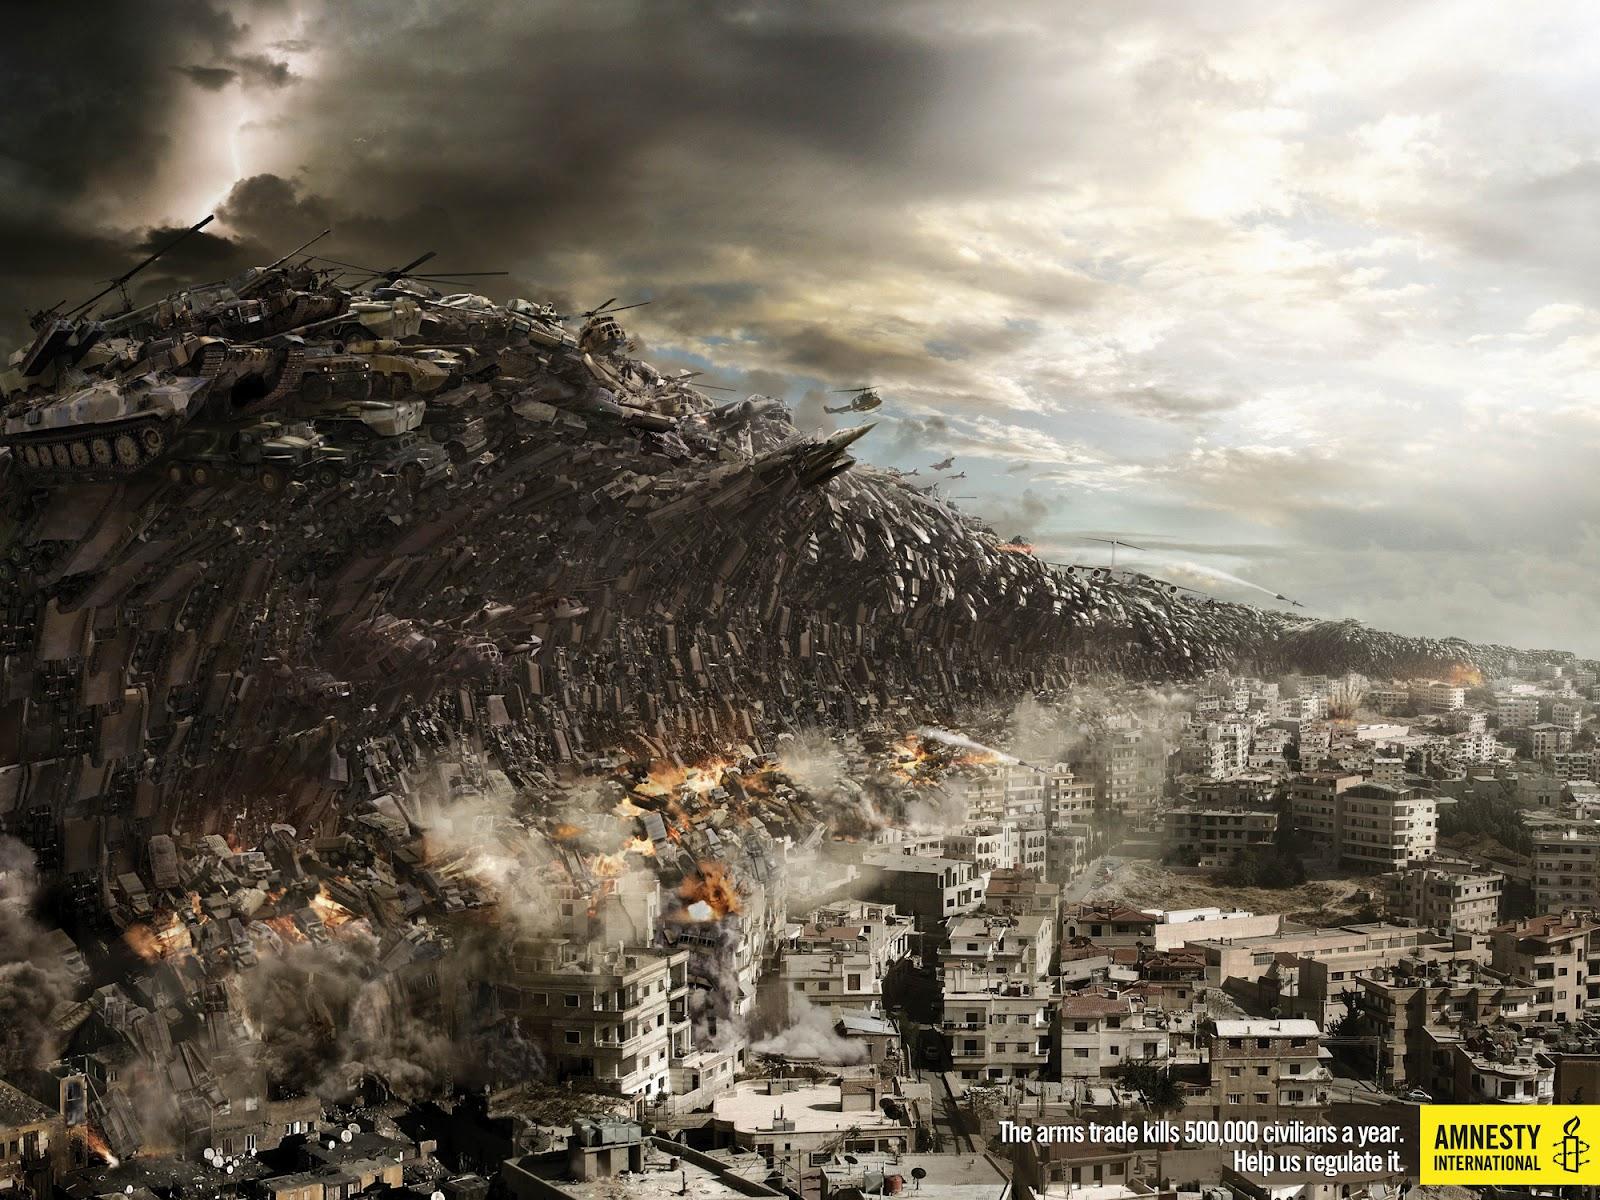 http://1.bp.blogspot.com/-bcuVh4riqJc/UFq0qqC2TXI/AAAAAAAAUJk/OVjQmfbCrPg/s1600/amnesty-international-tsunami.jpg